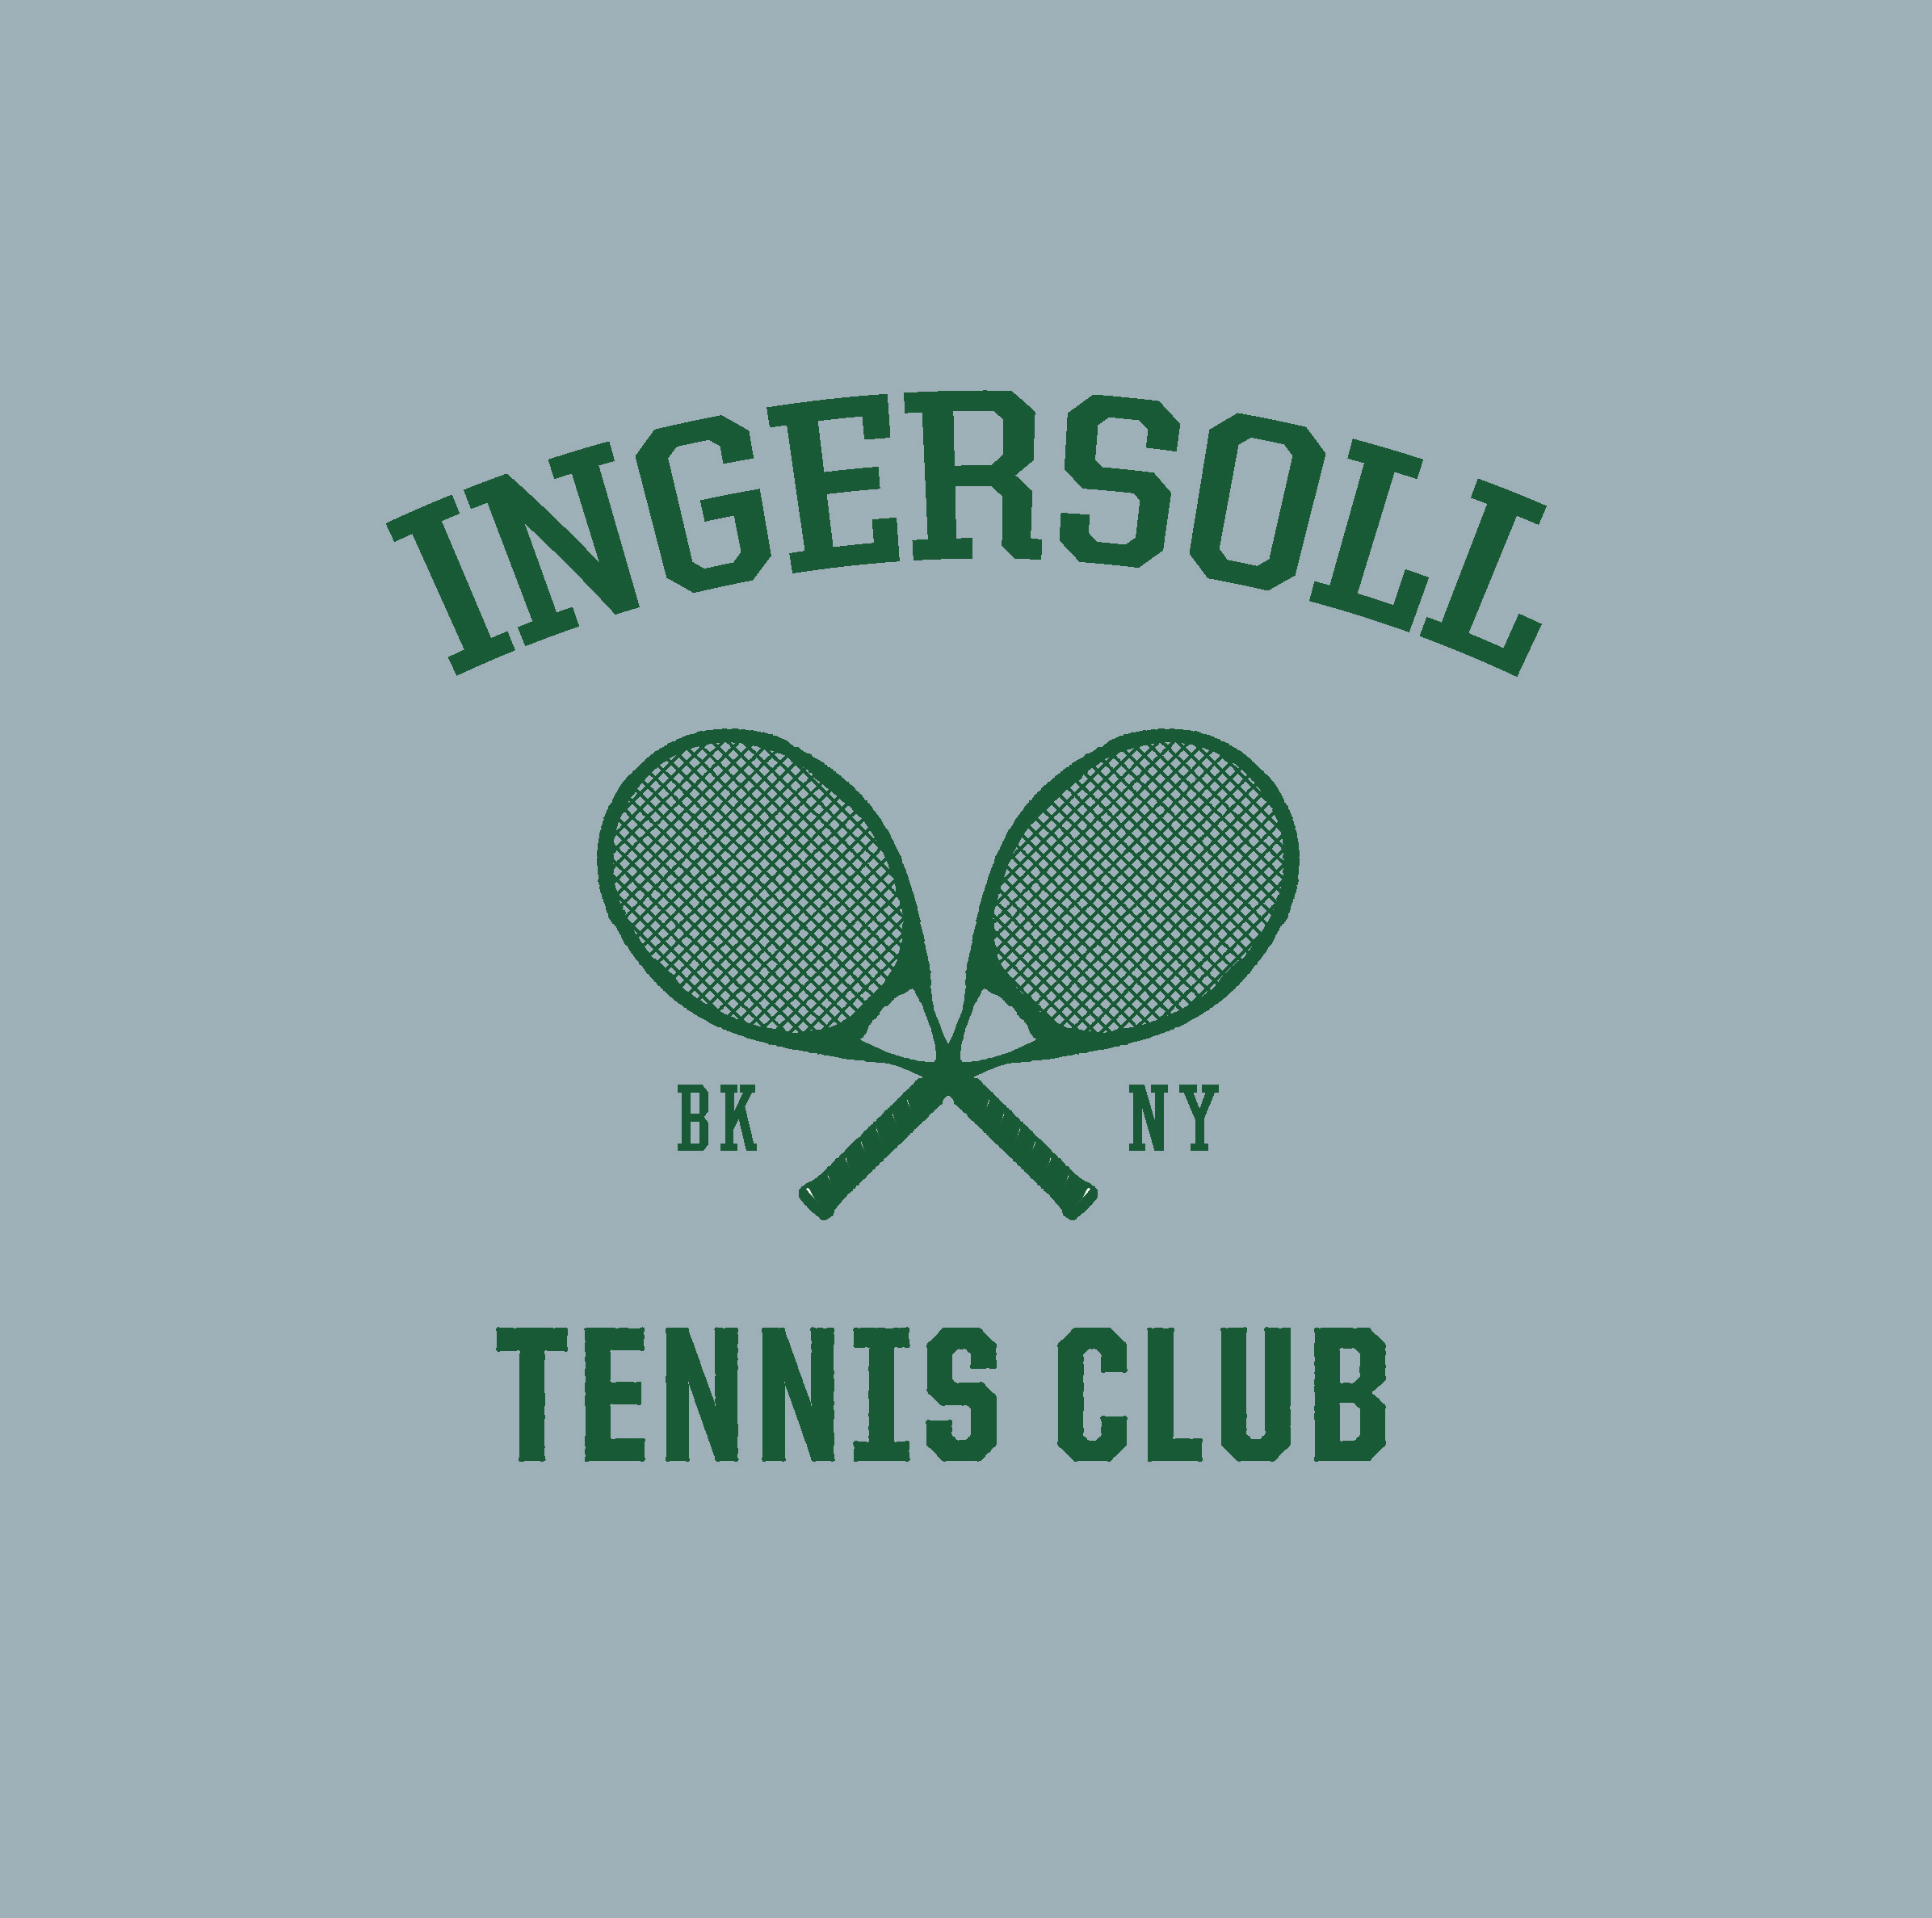 ingersoll brighter green-0.jpg